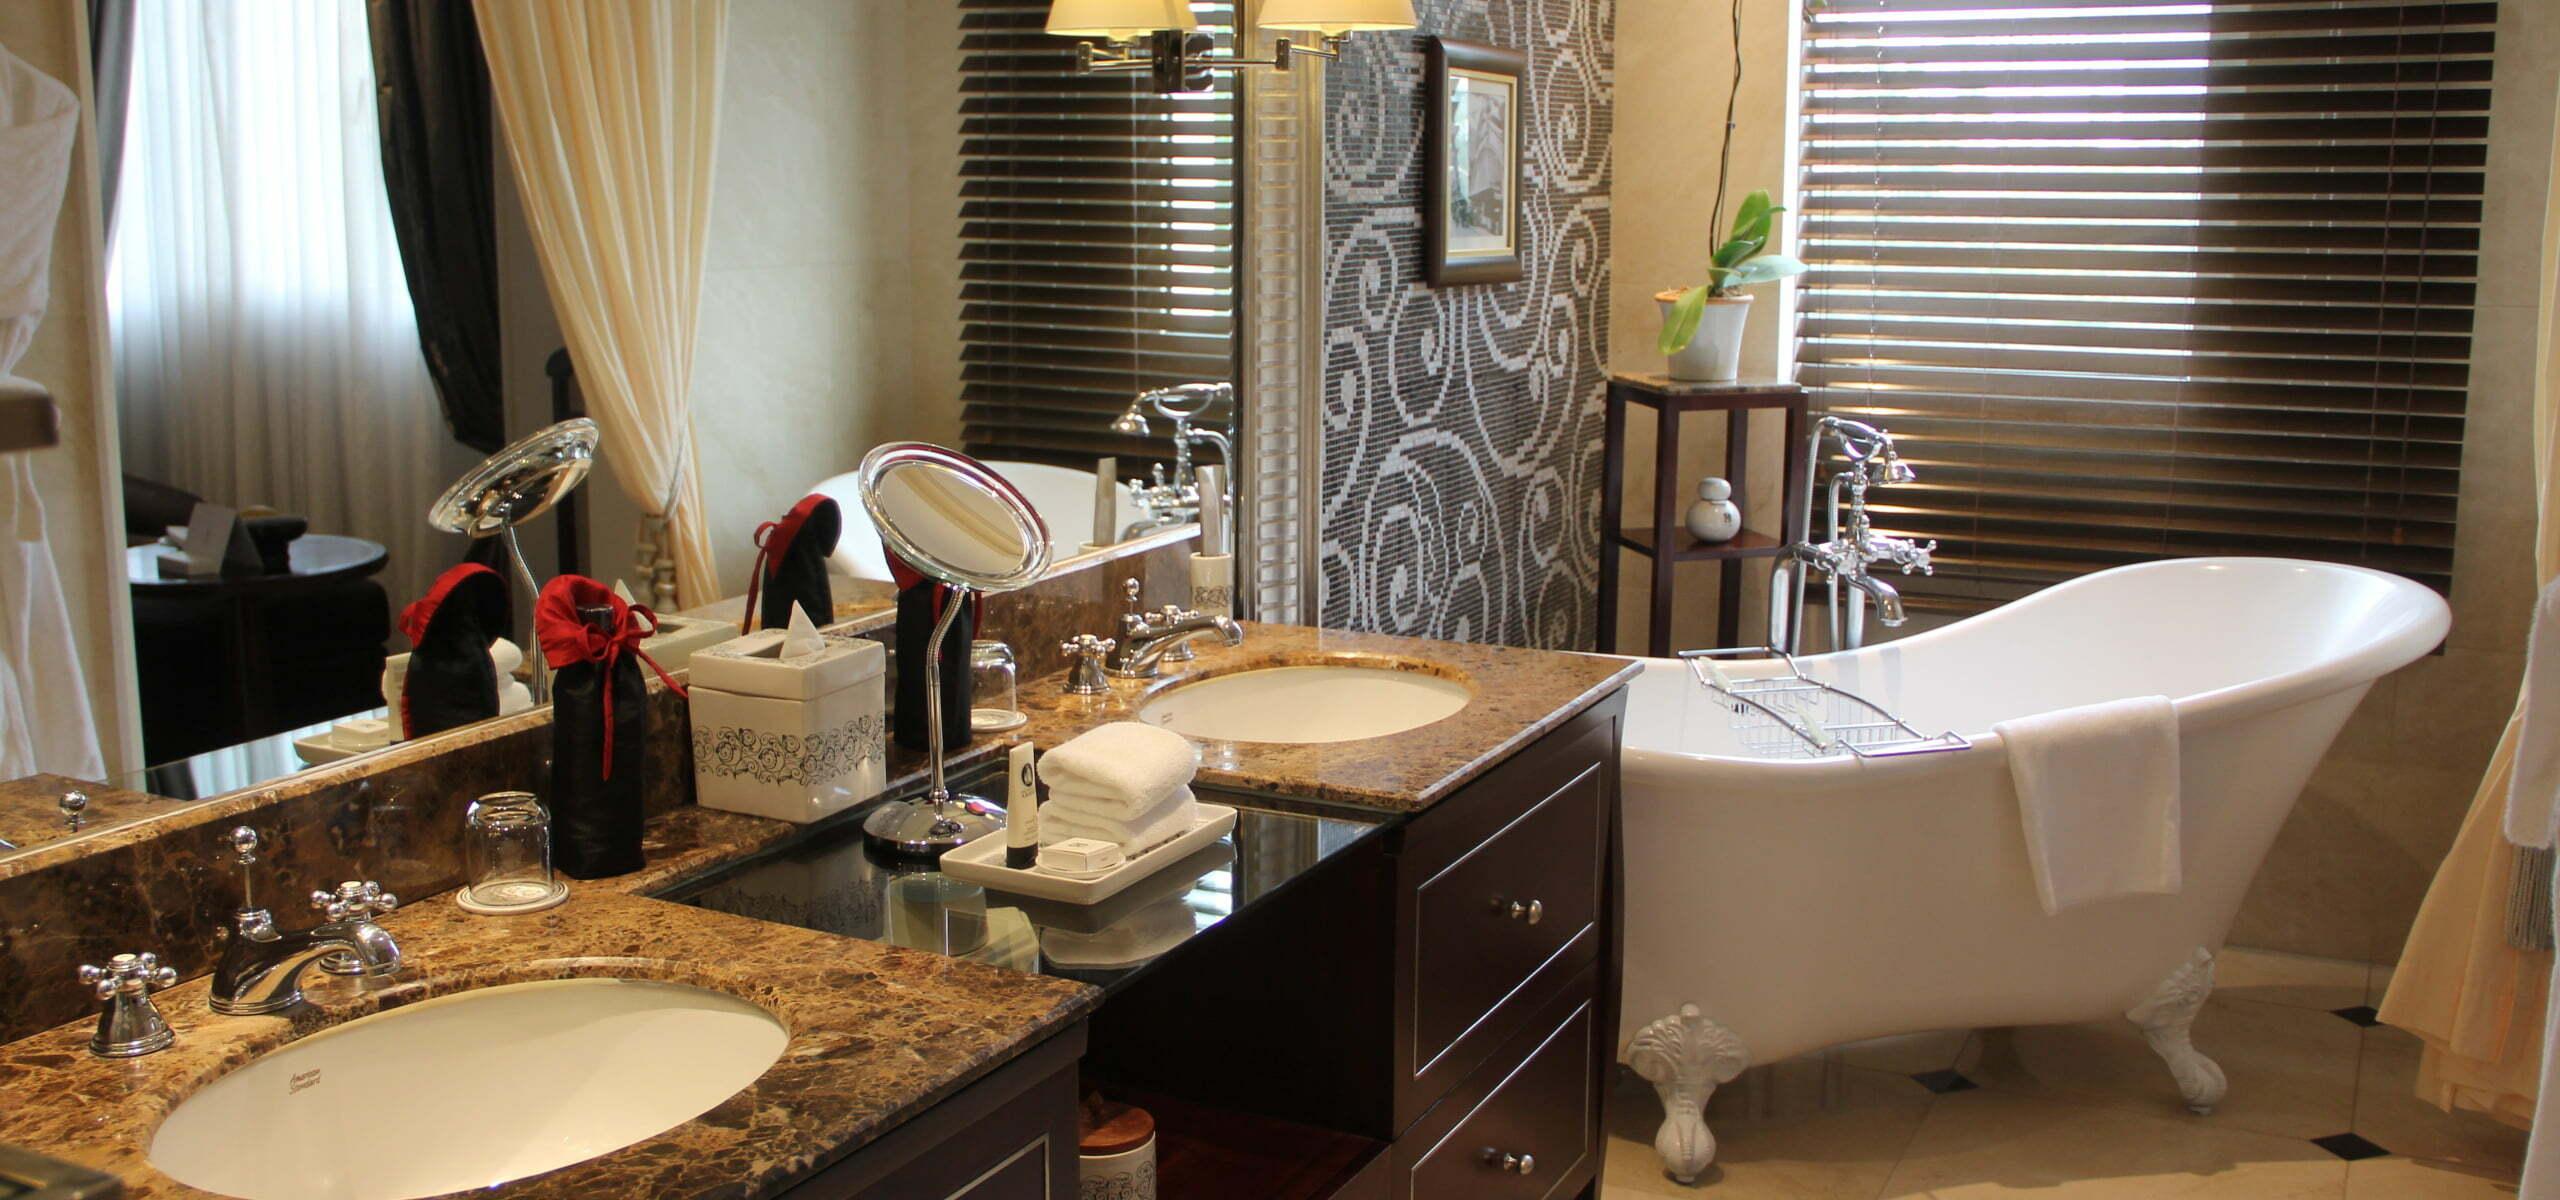 Sofitel Metropole Hanoi Bathroom